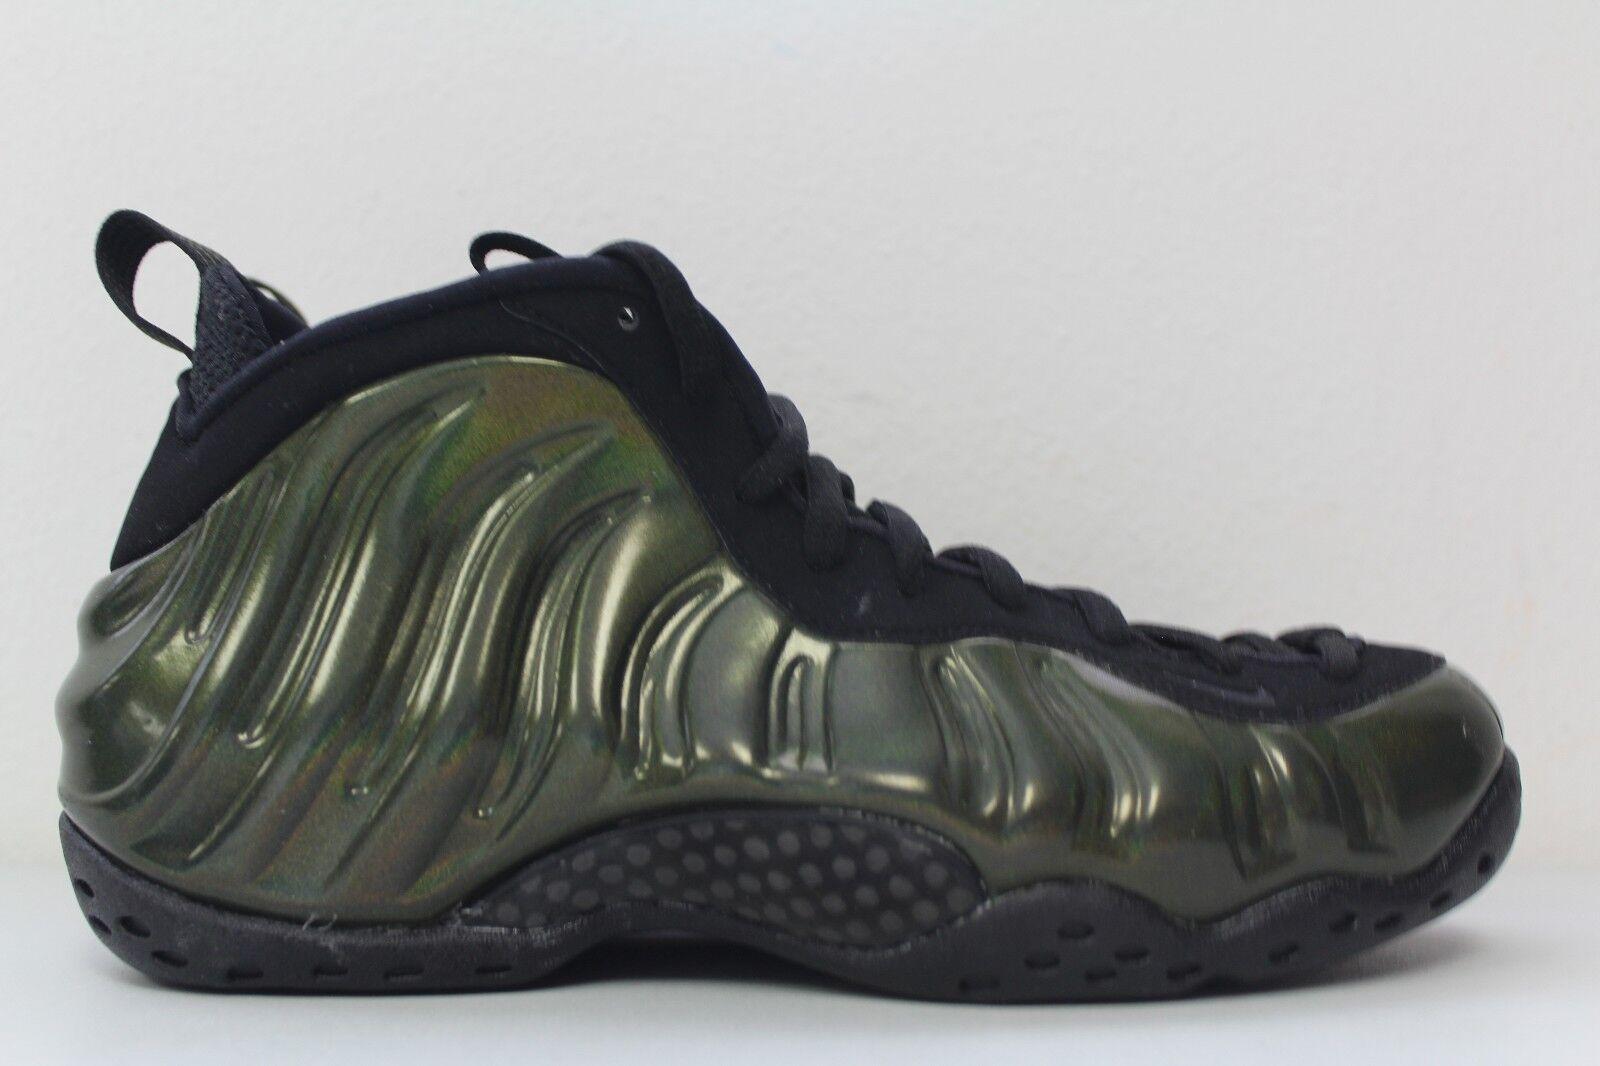 Nike Mens Air Foamposite One Legion Green Black Black Black 314996 301 Size 11.5 38c529